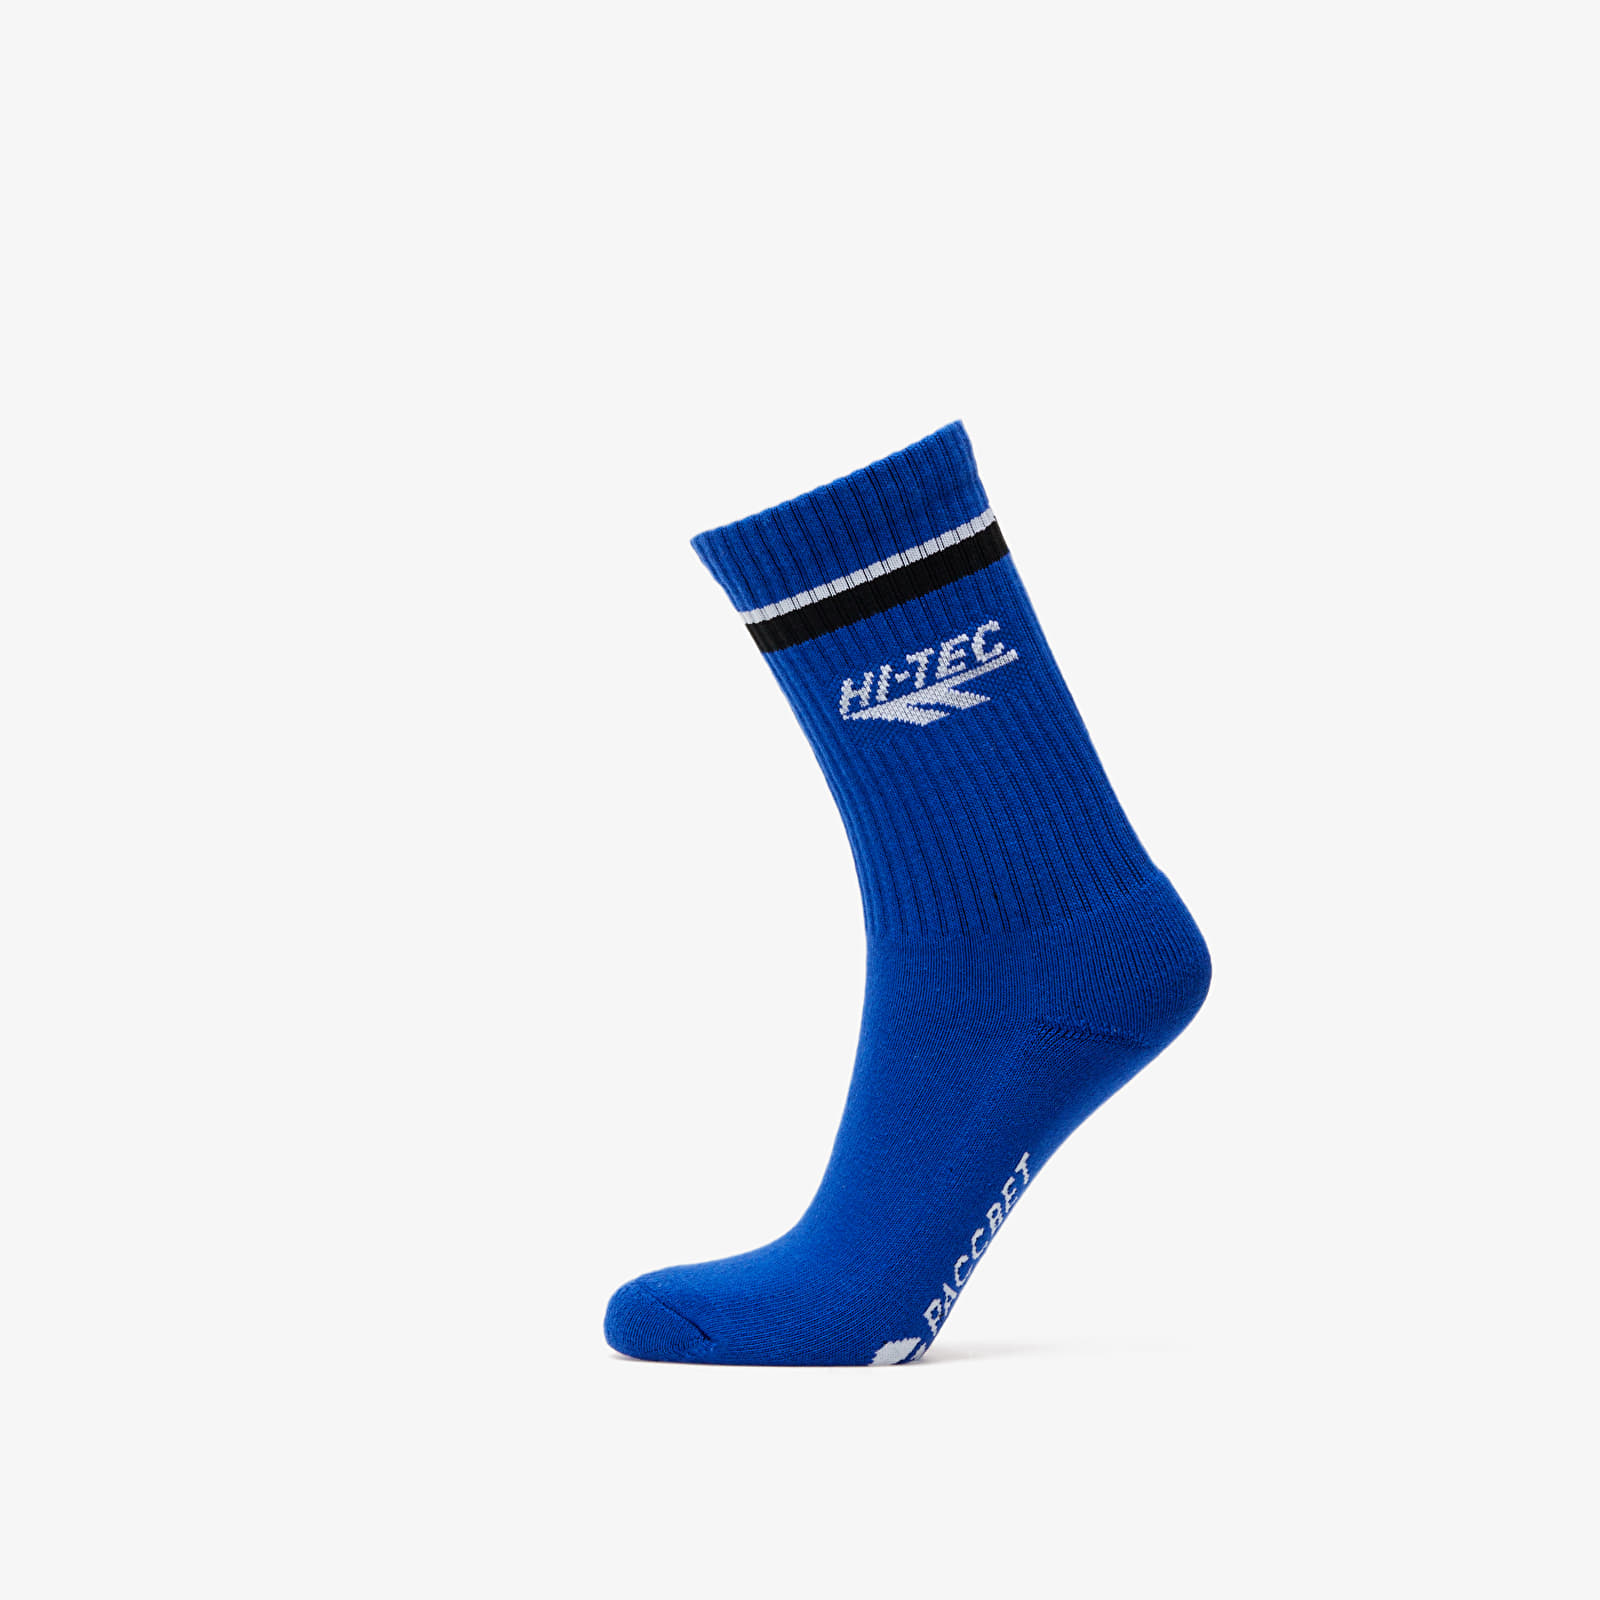 Niže čarape PACCBET x HI-TEC Socks Blue